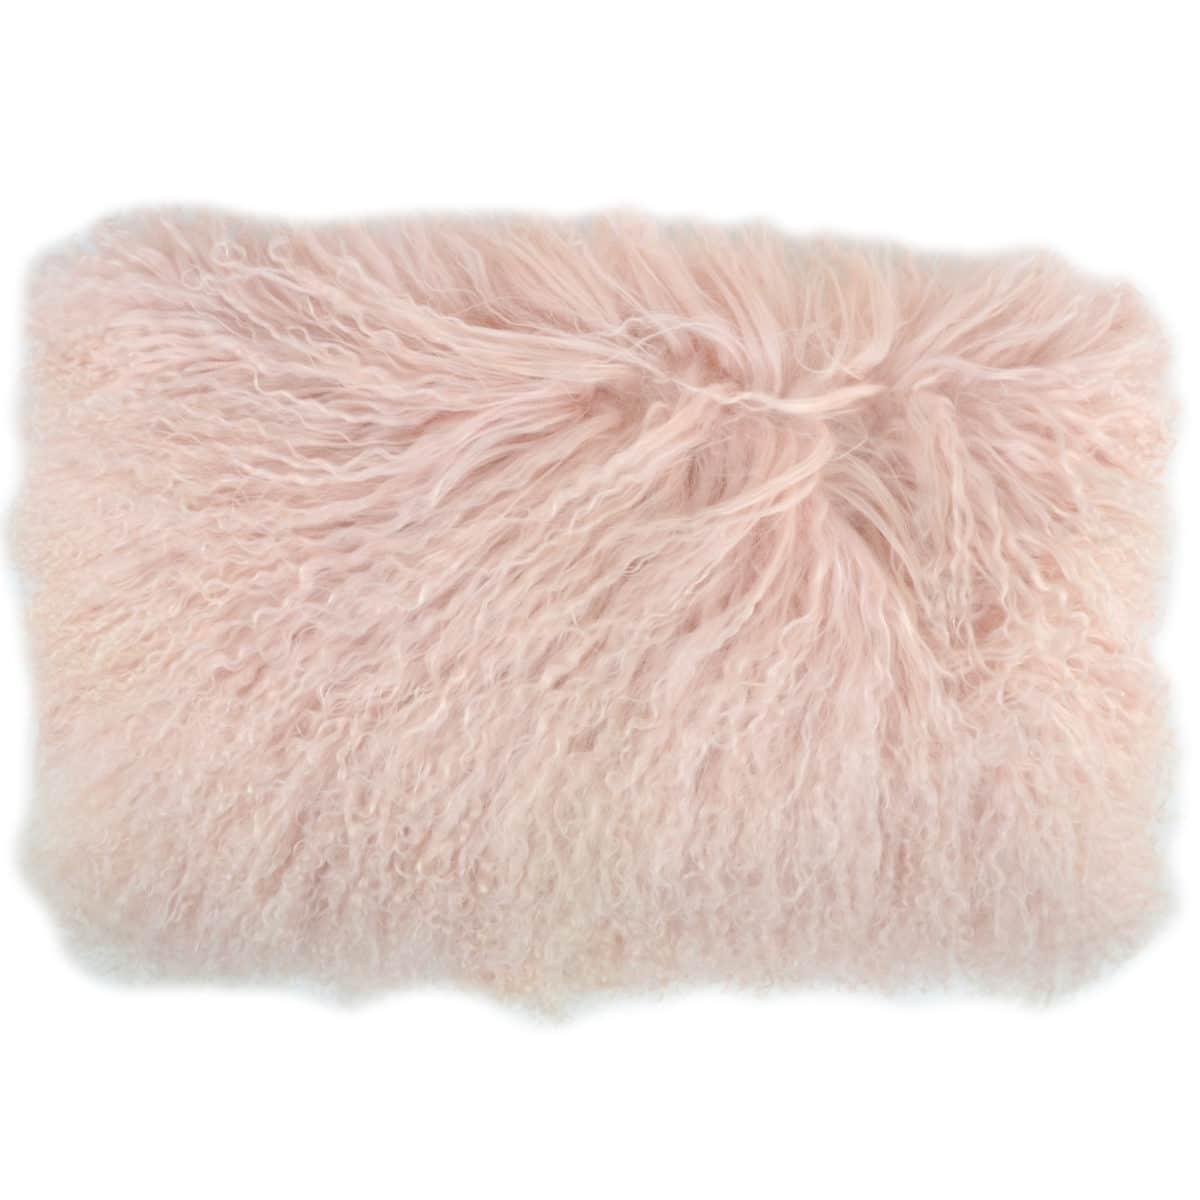 Snugrugs Mongolian Sheepskin Cushion 30cm x 50cm – Light Pink